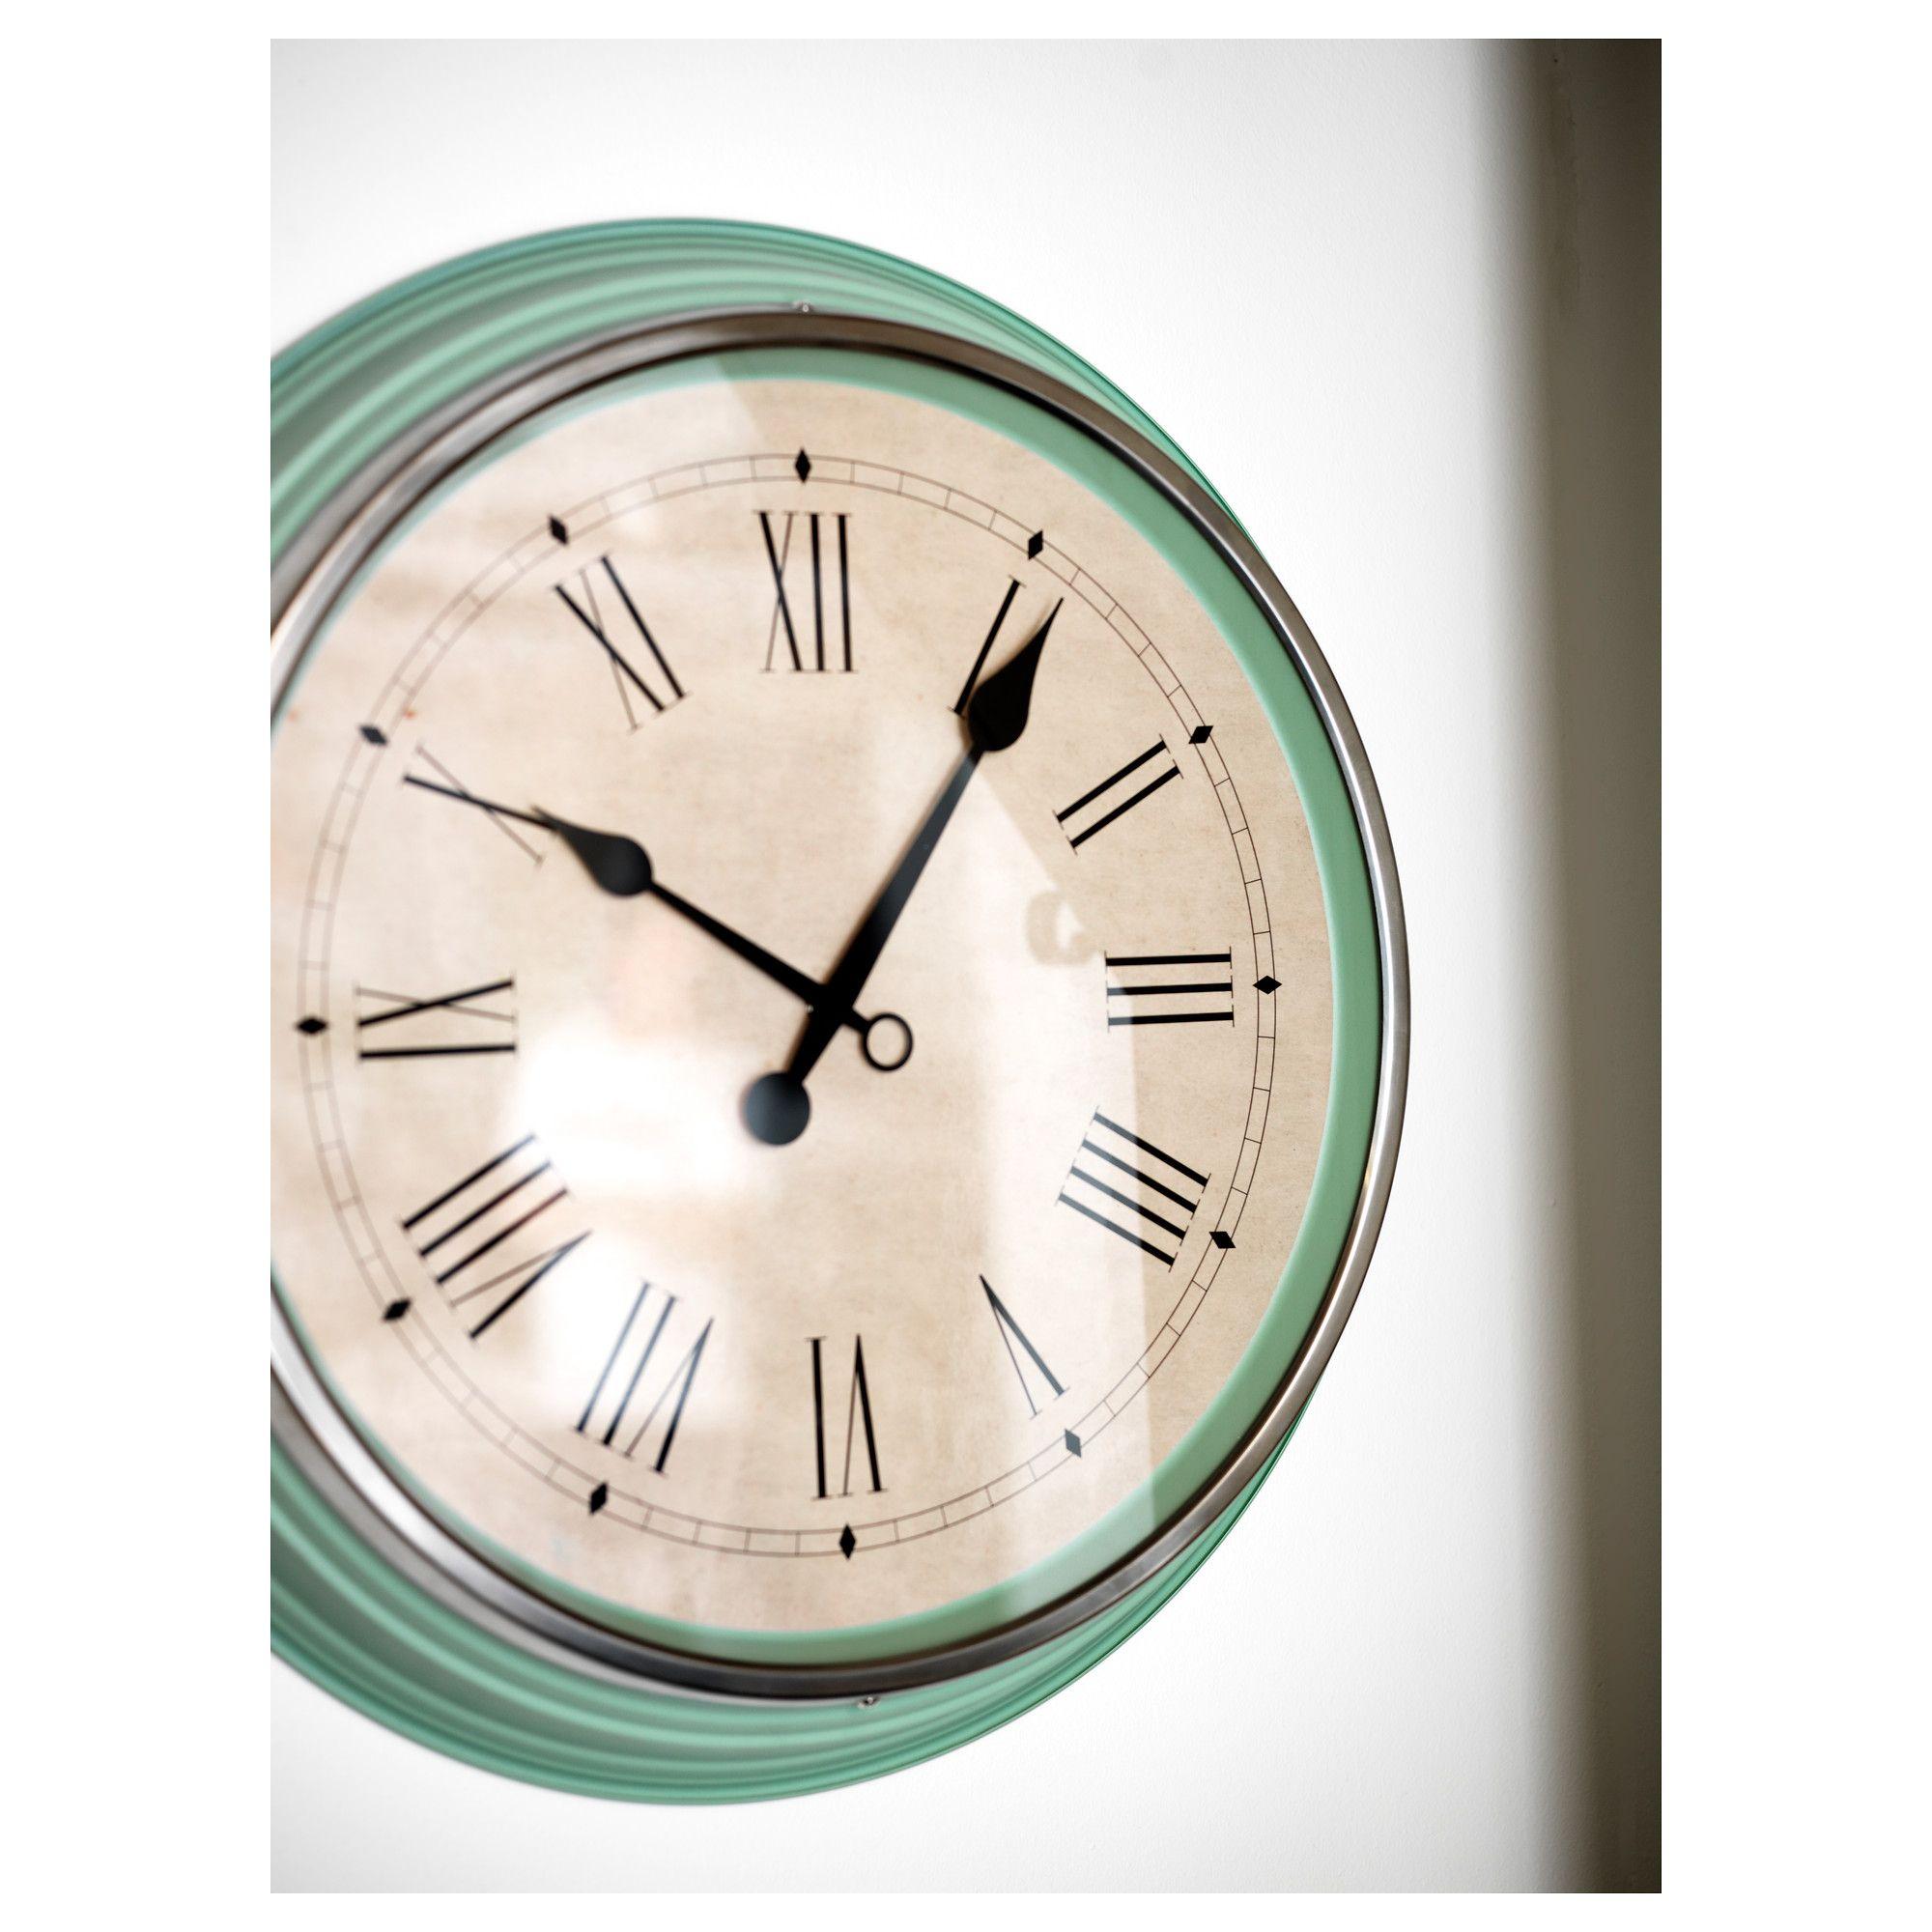 Ikea Skovel Wall Clock Green Products Pinterest Wall Clock